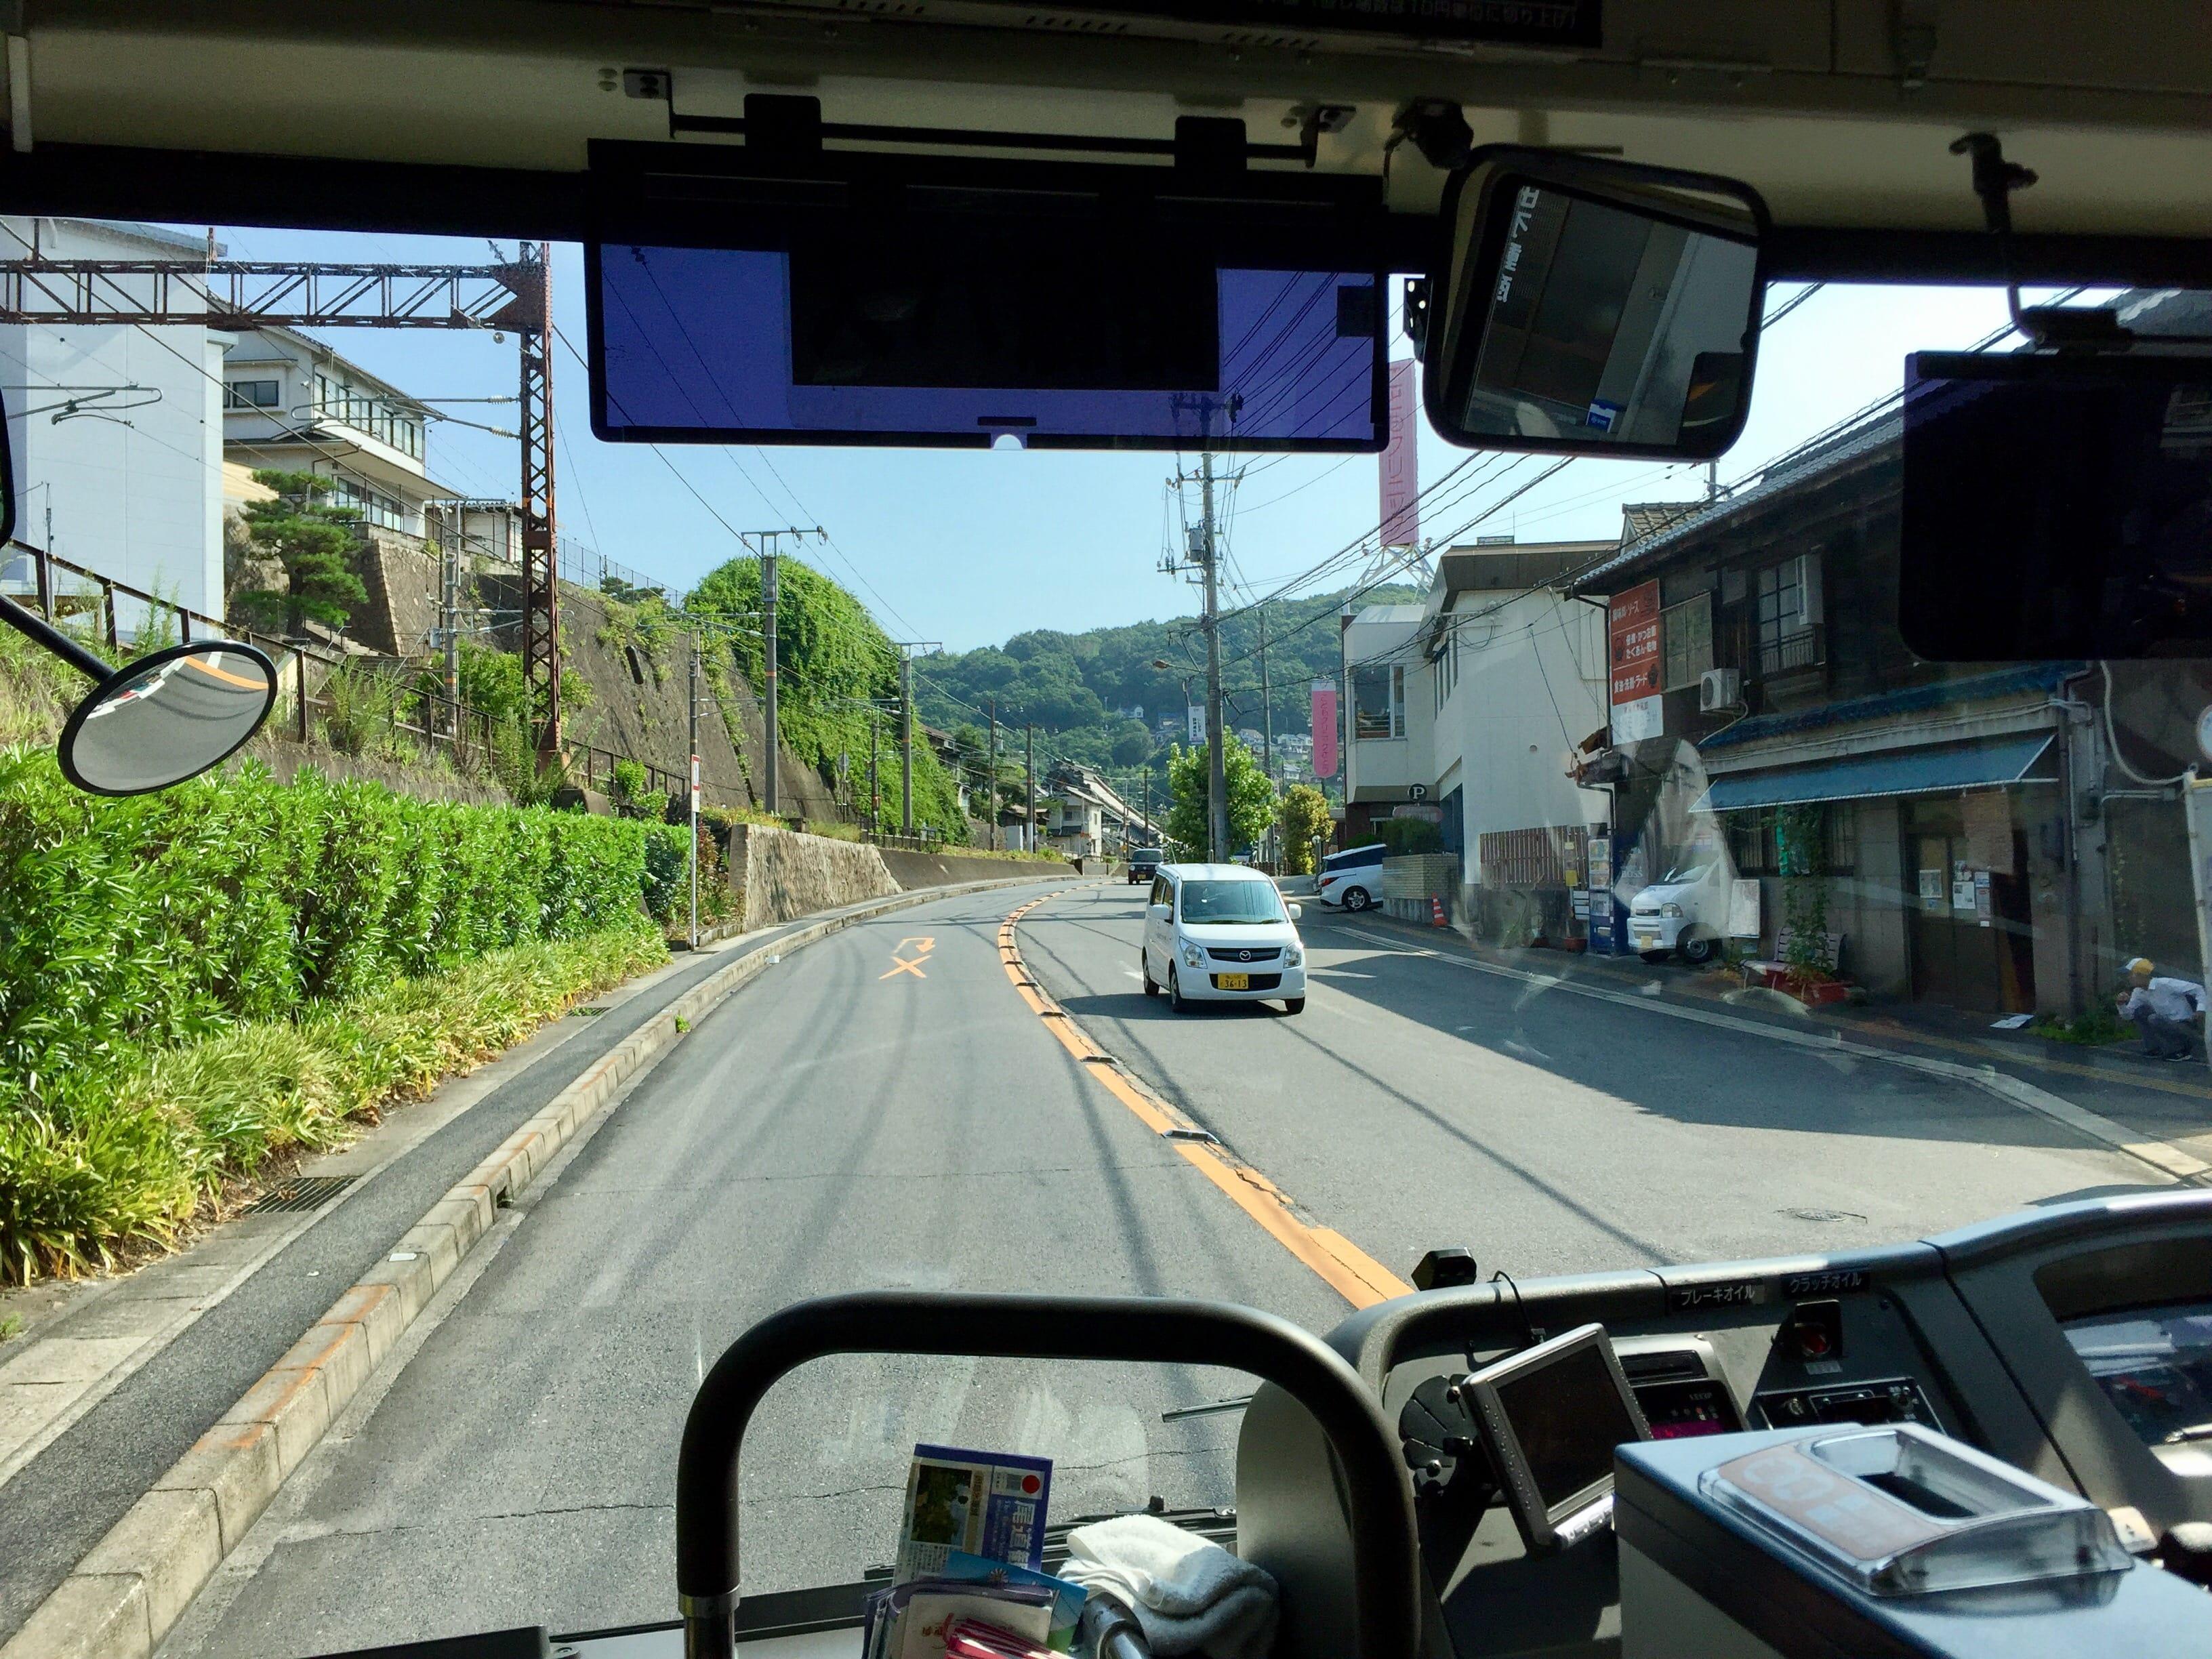 Going along National Highway 2 to Onomichi Bridge